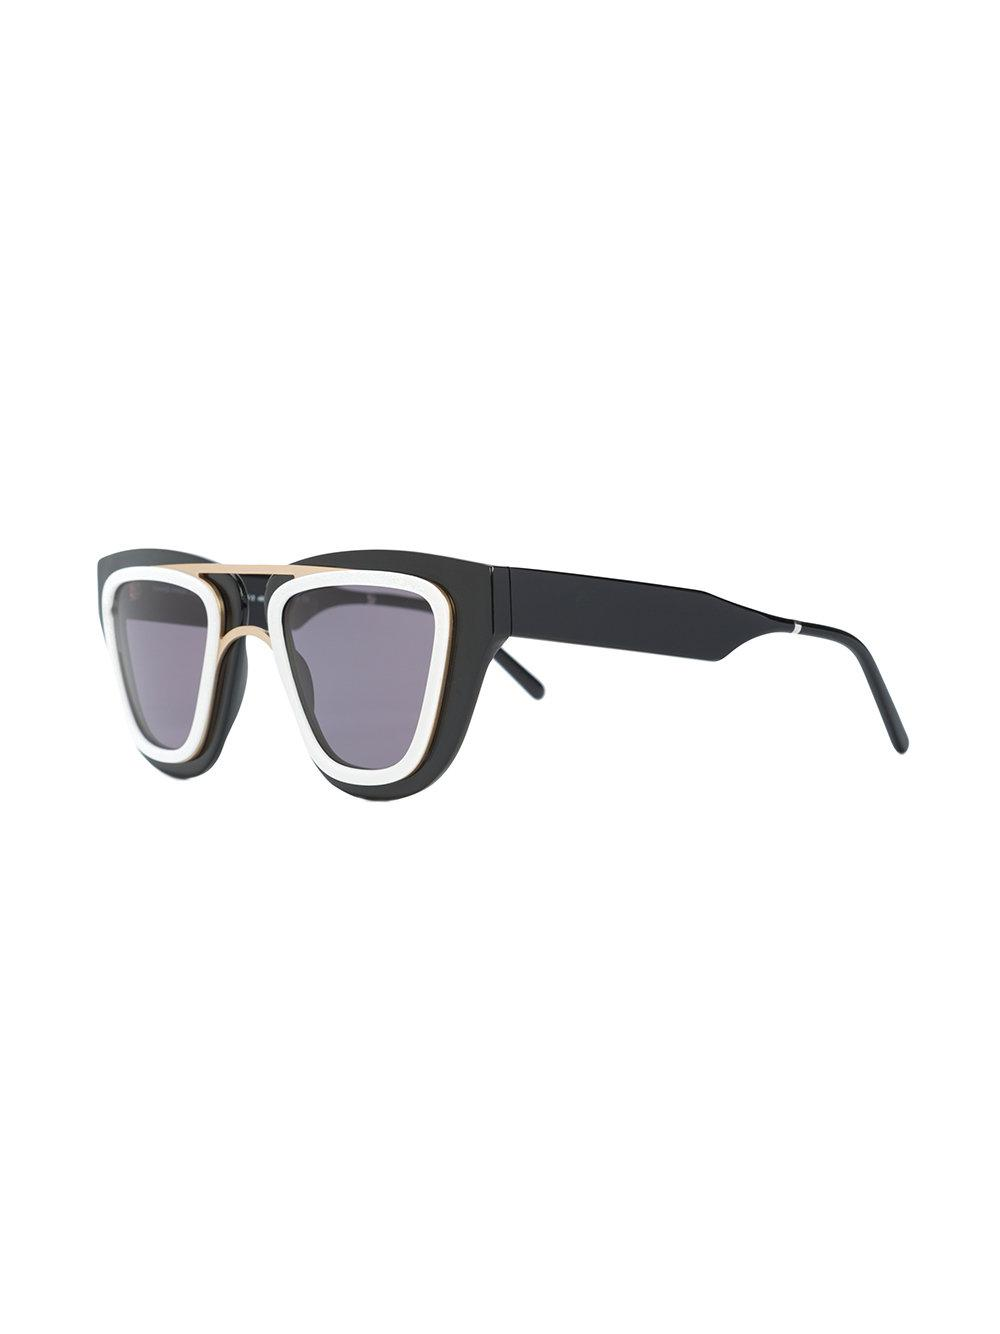 Smoke X Mirrors Contrast-trim Sunglasses in Black